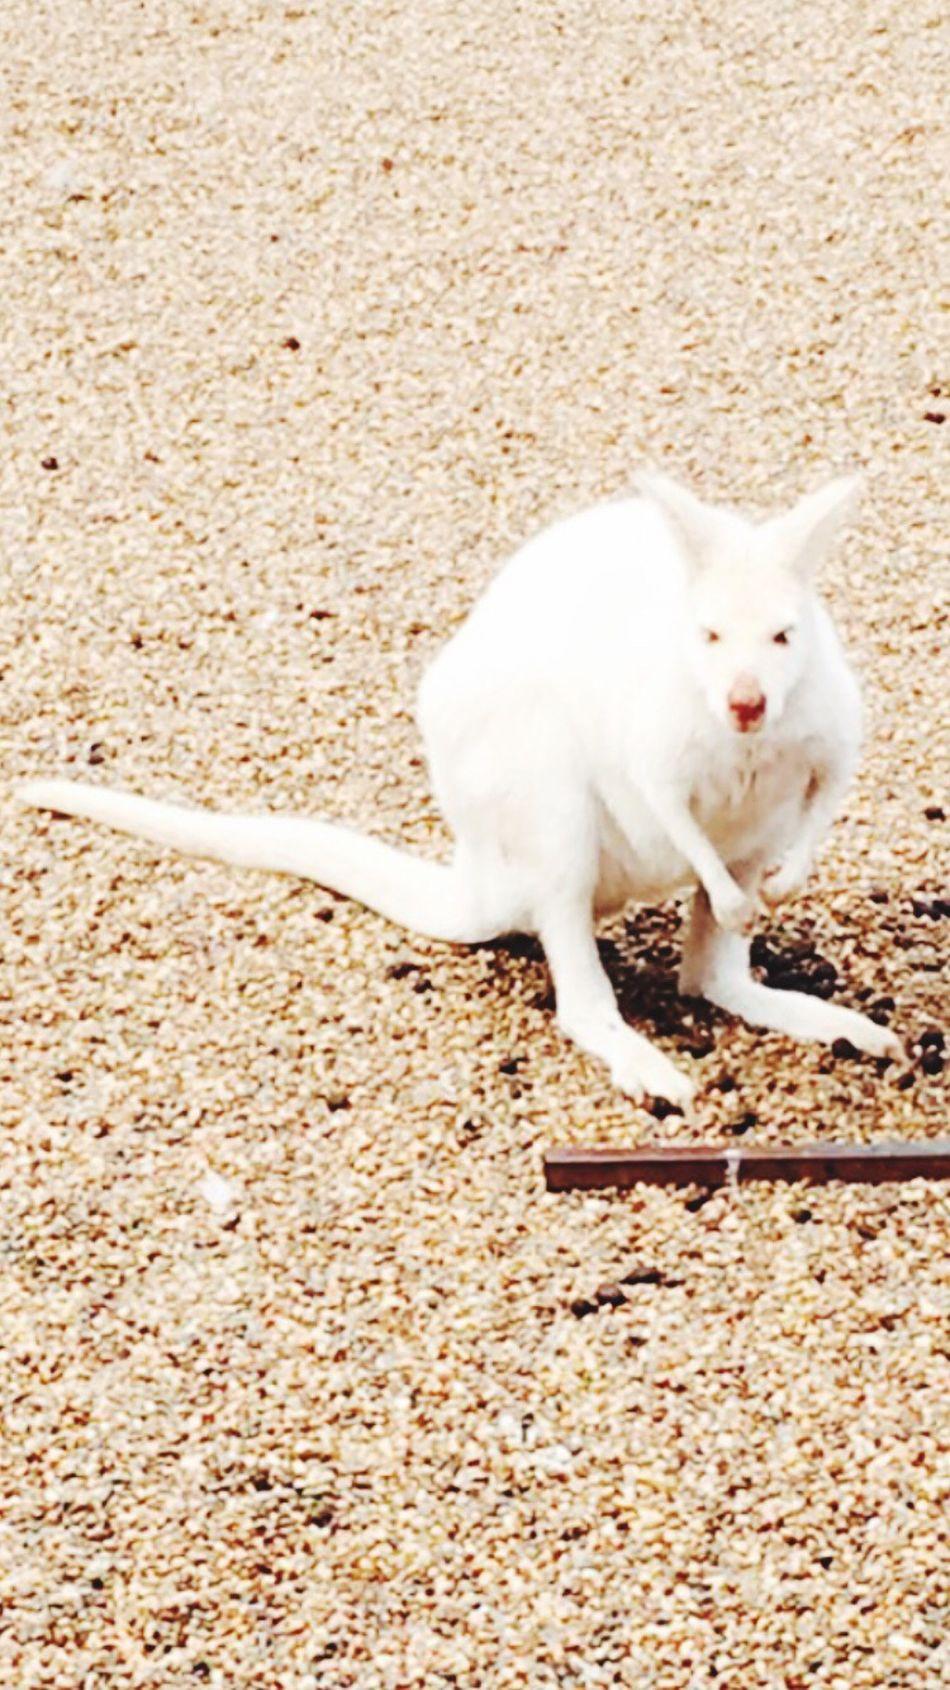 One Animal Animal Themes Pets Domestic Animals Mammal Dog Full Length Standing No People Day Outdoors Nature Jack Russell Terrier Kangaroo White Kangaroo Sand